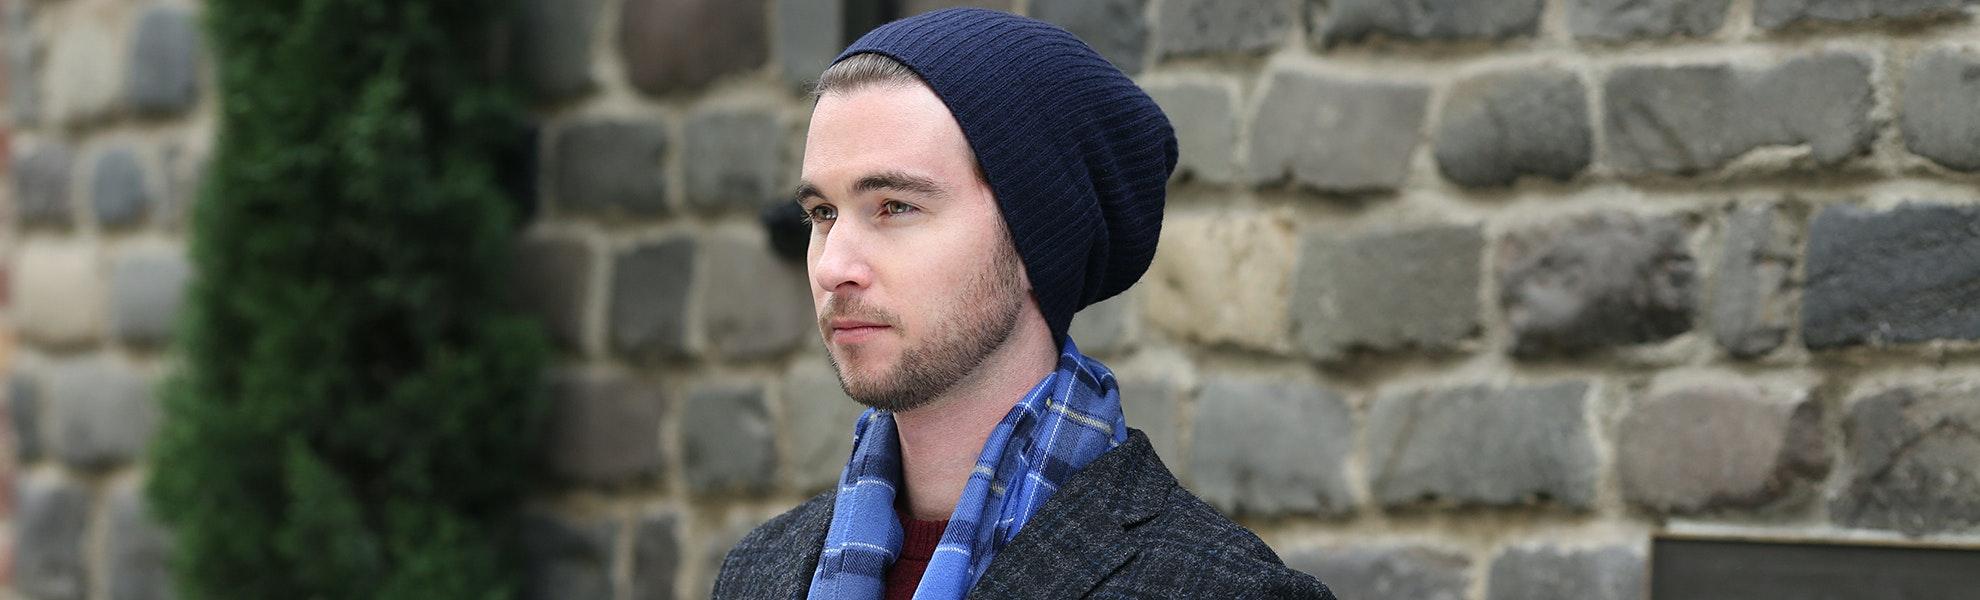 Royal Speyside Ribbed Knit Hats